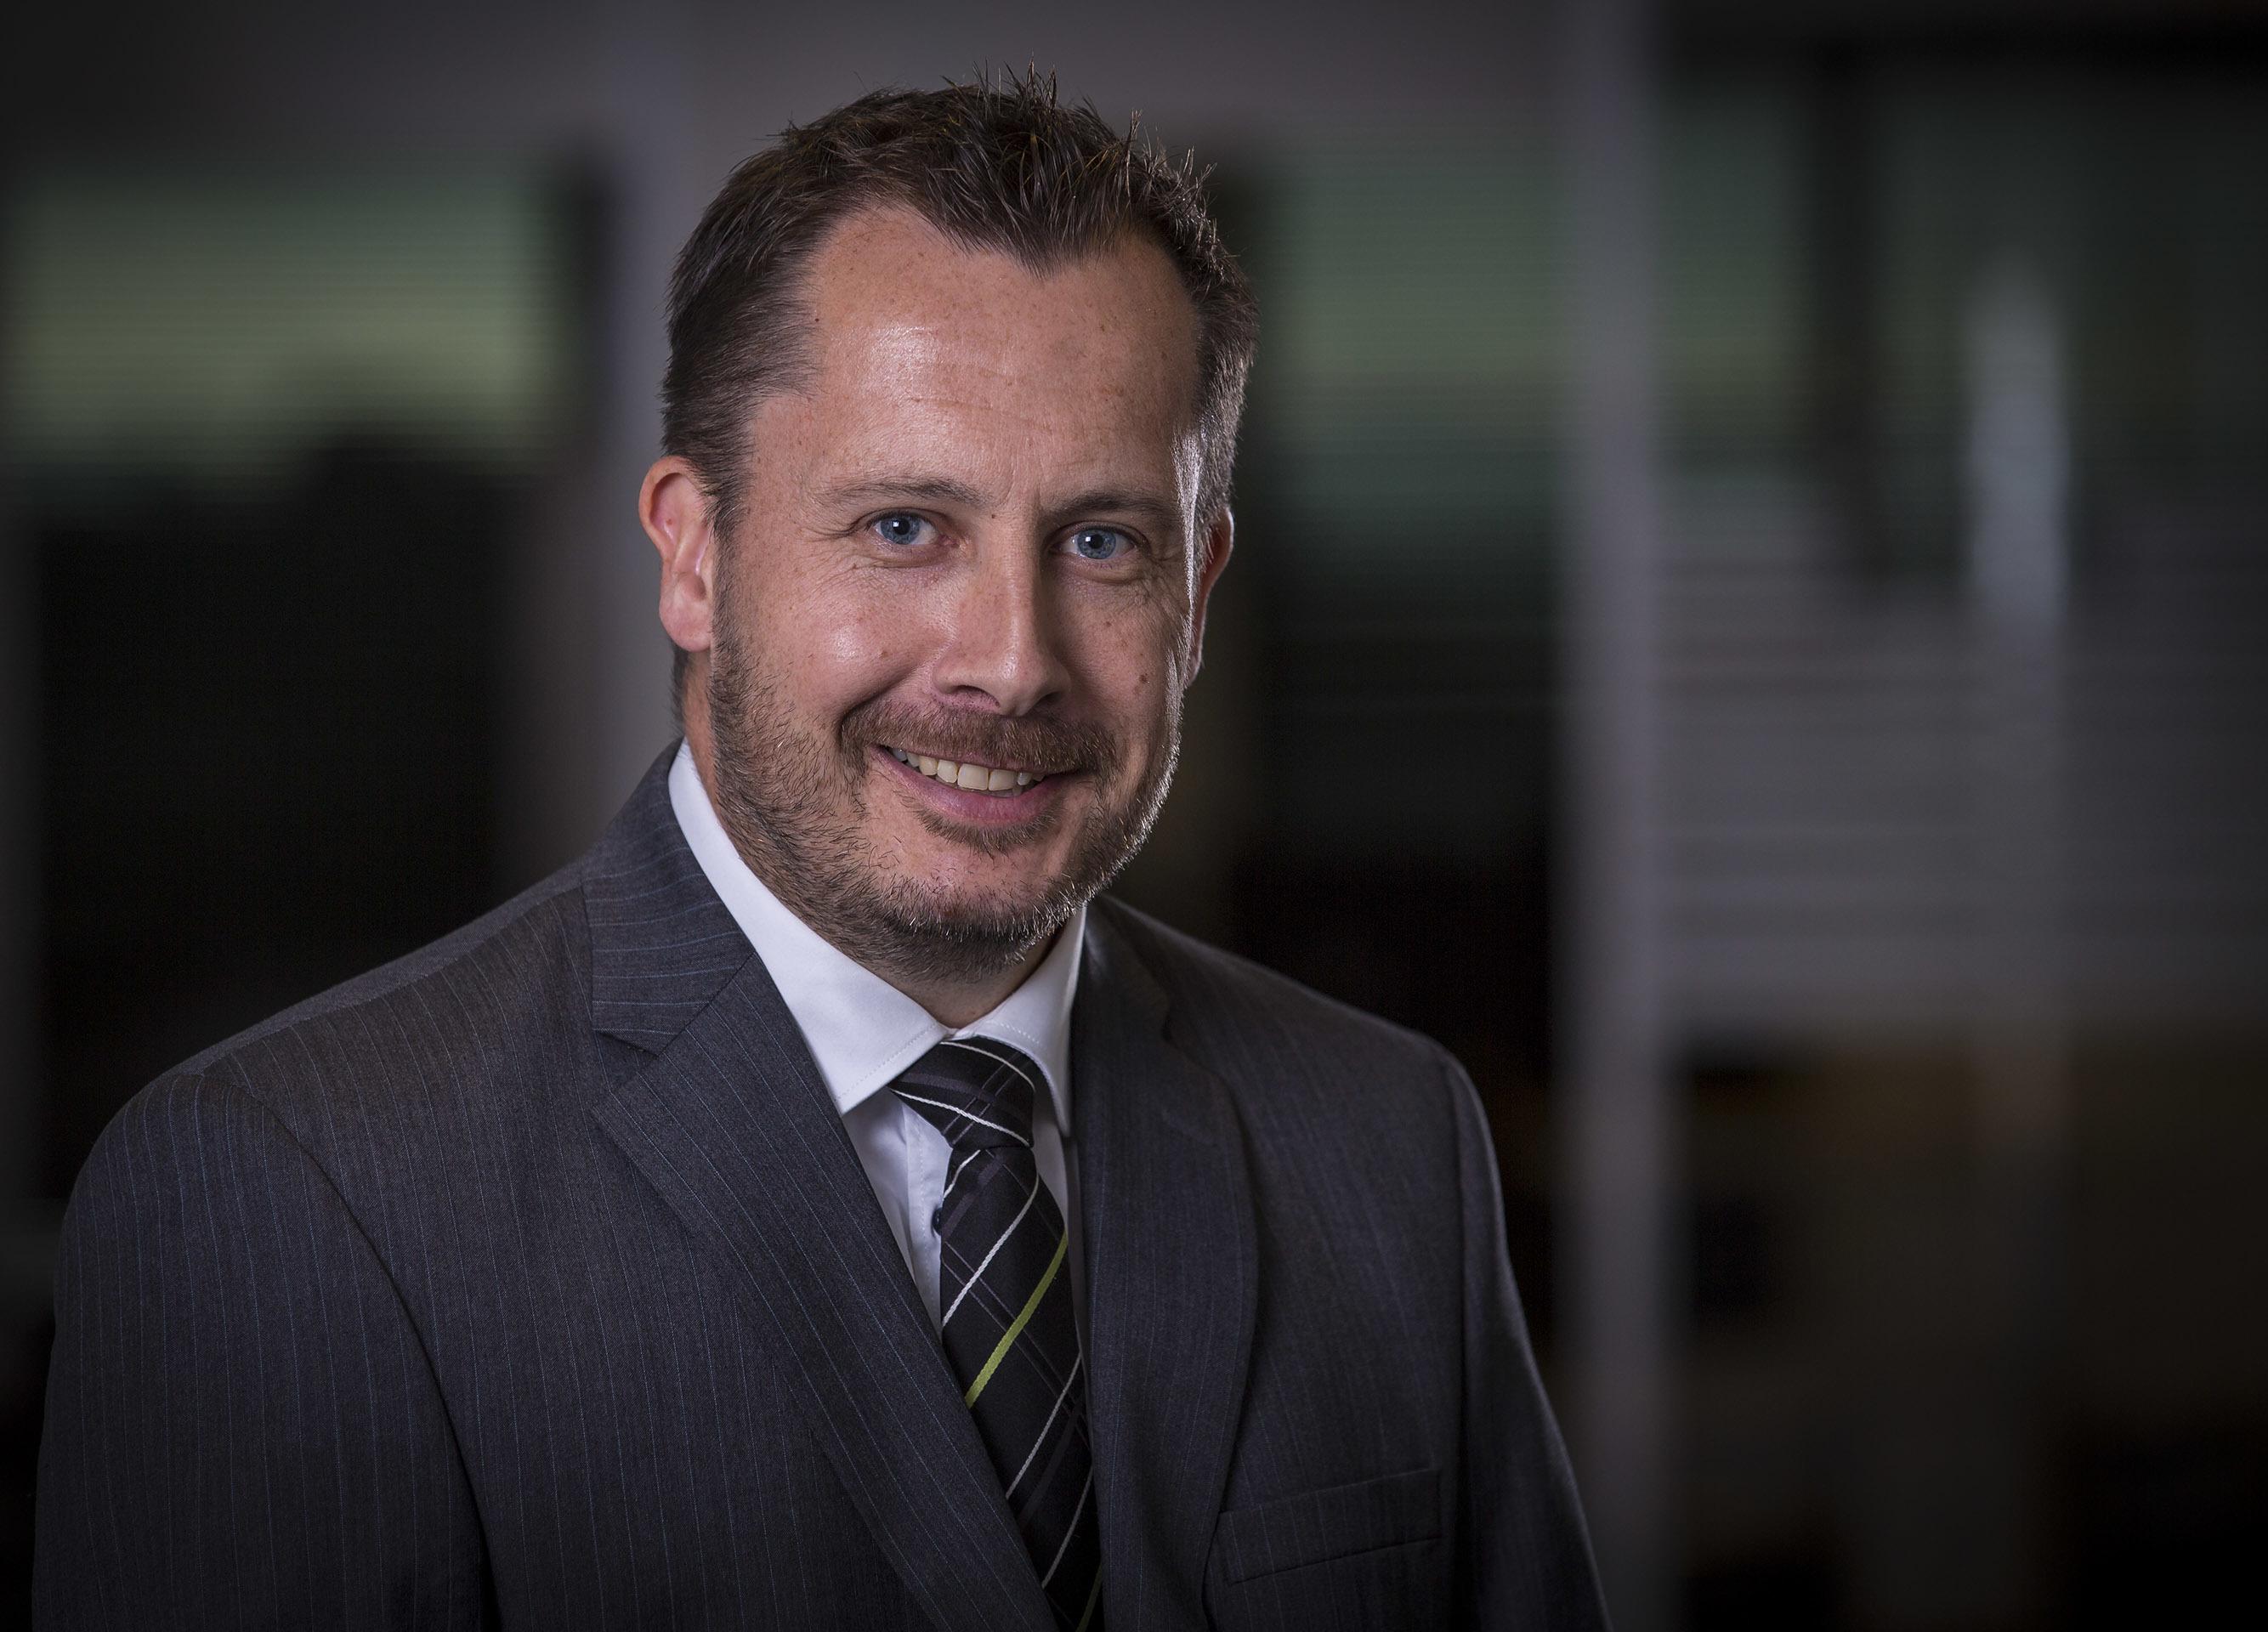 Trond Møller, EnerMech General Manager, Norway